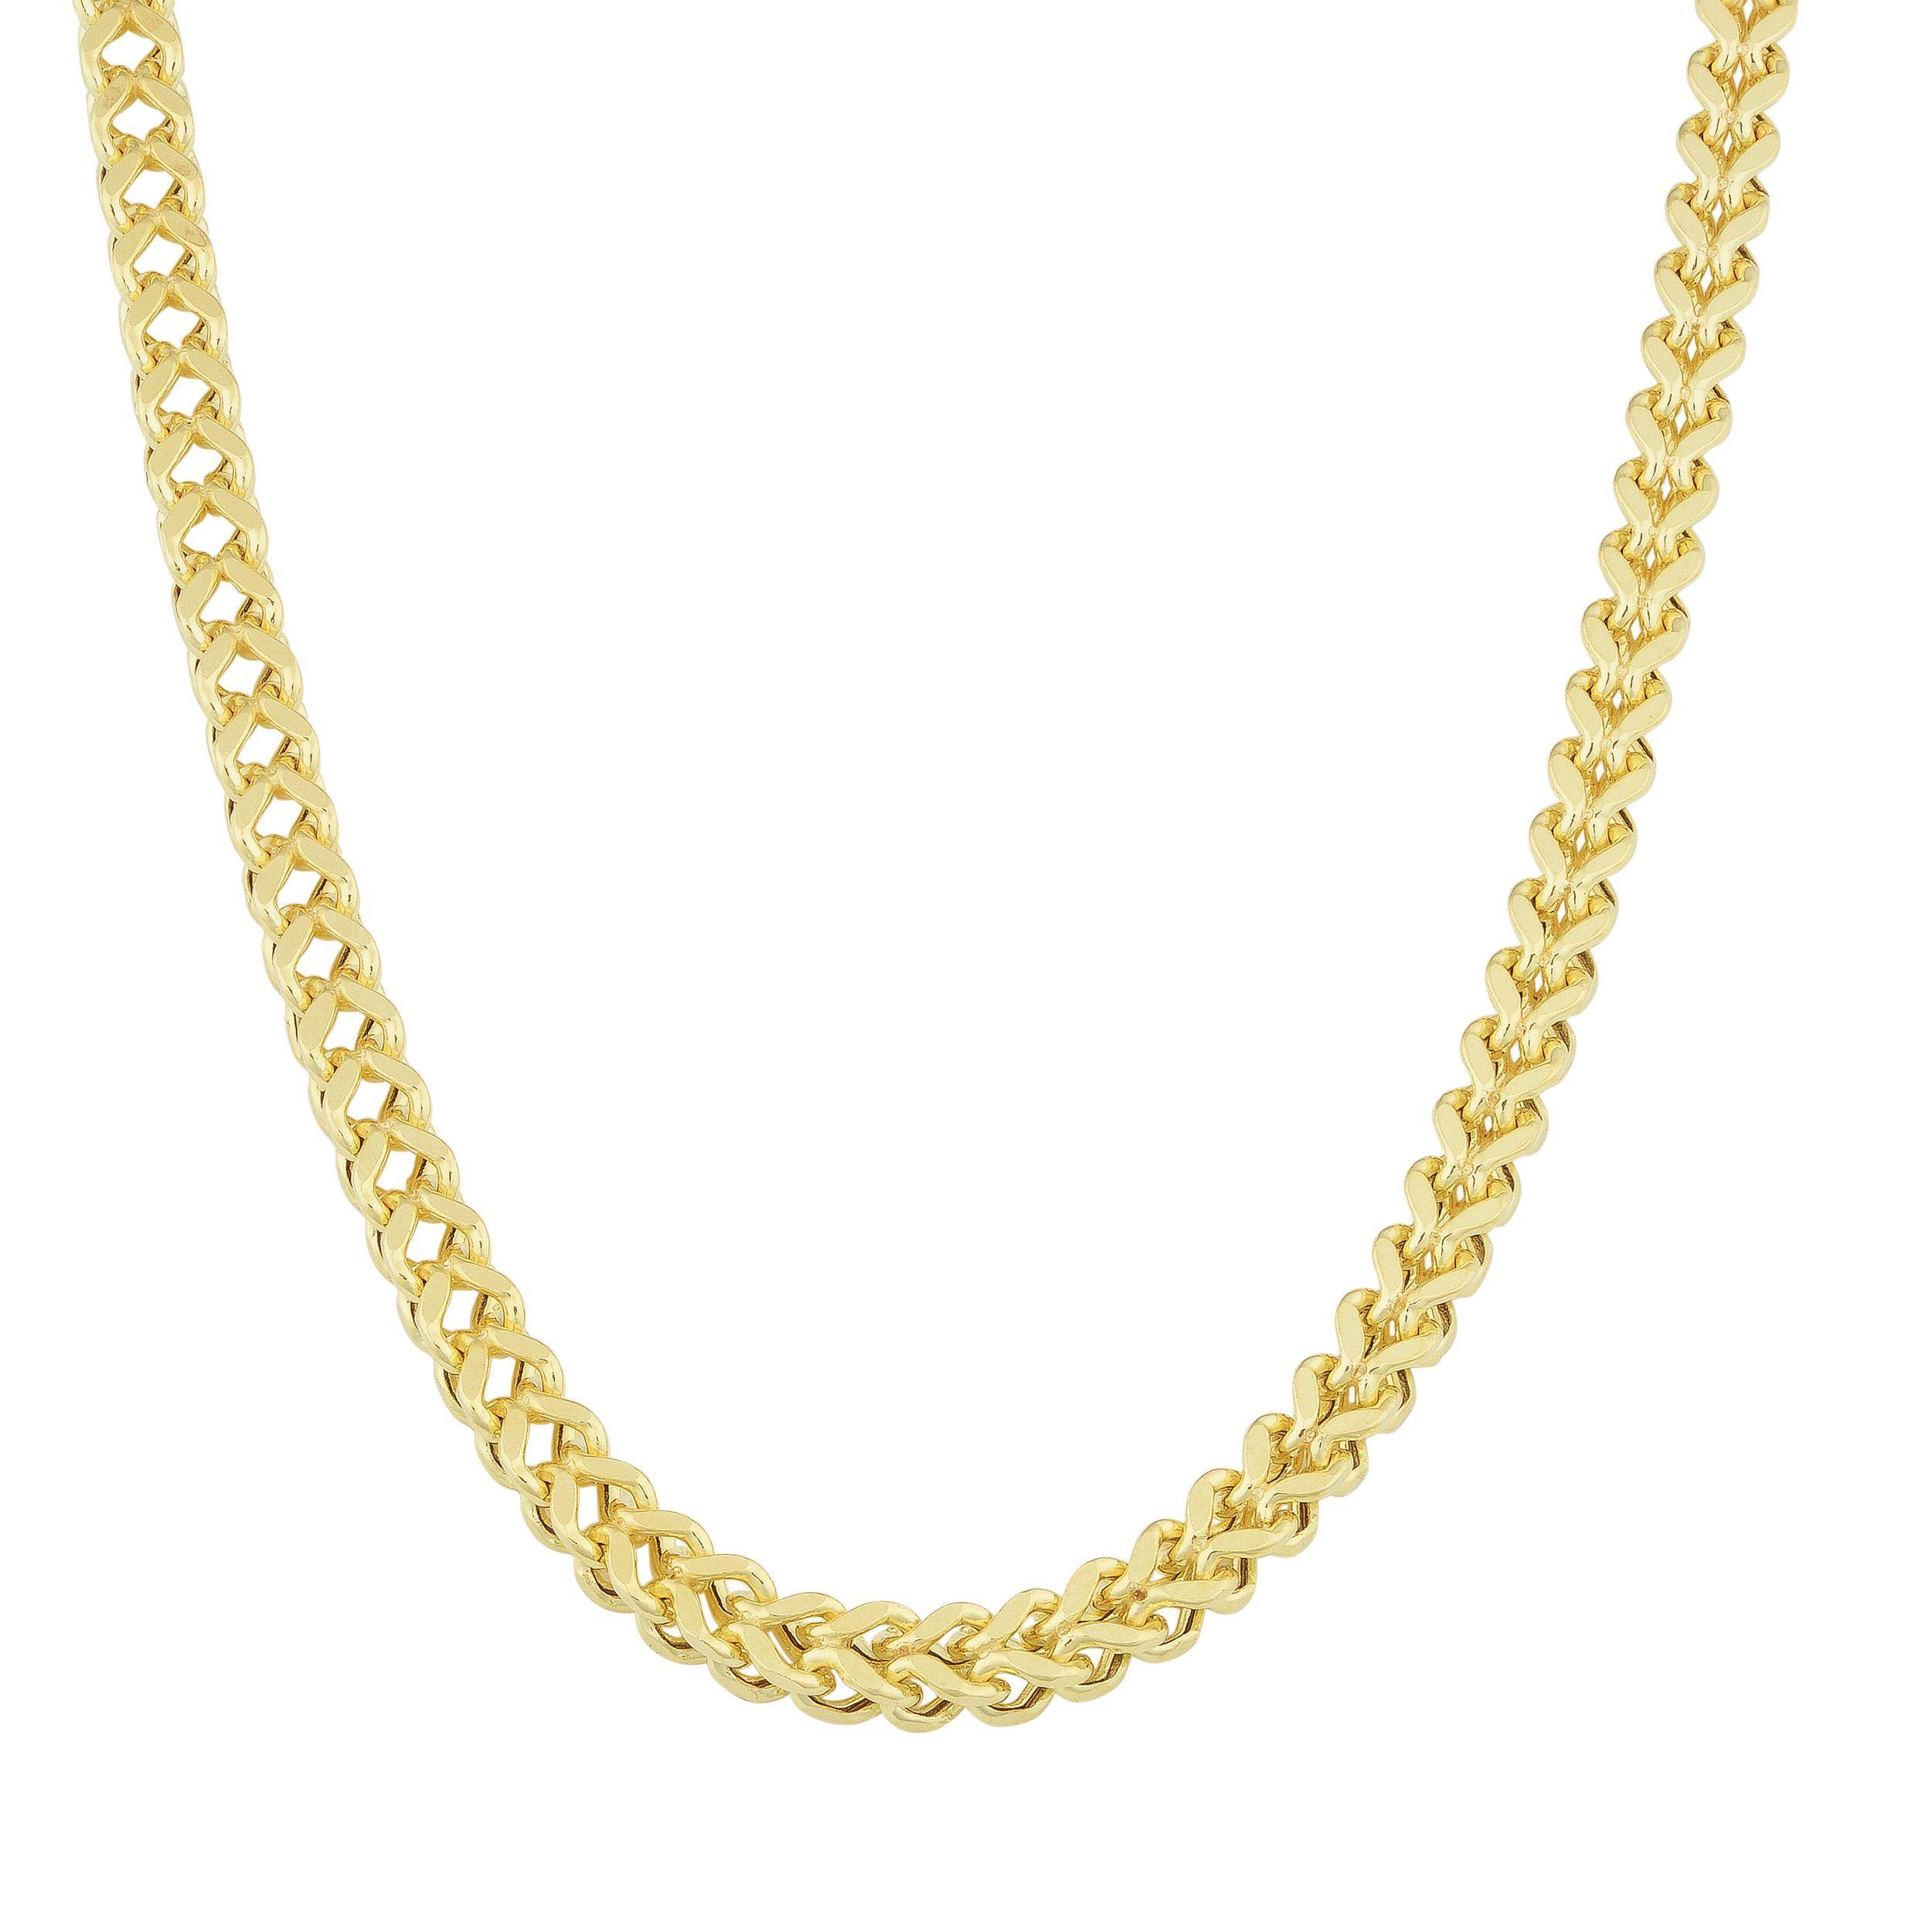 Fremada 14k Gold Bold Square Franco Necklace